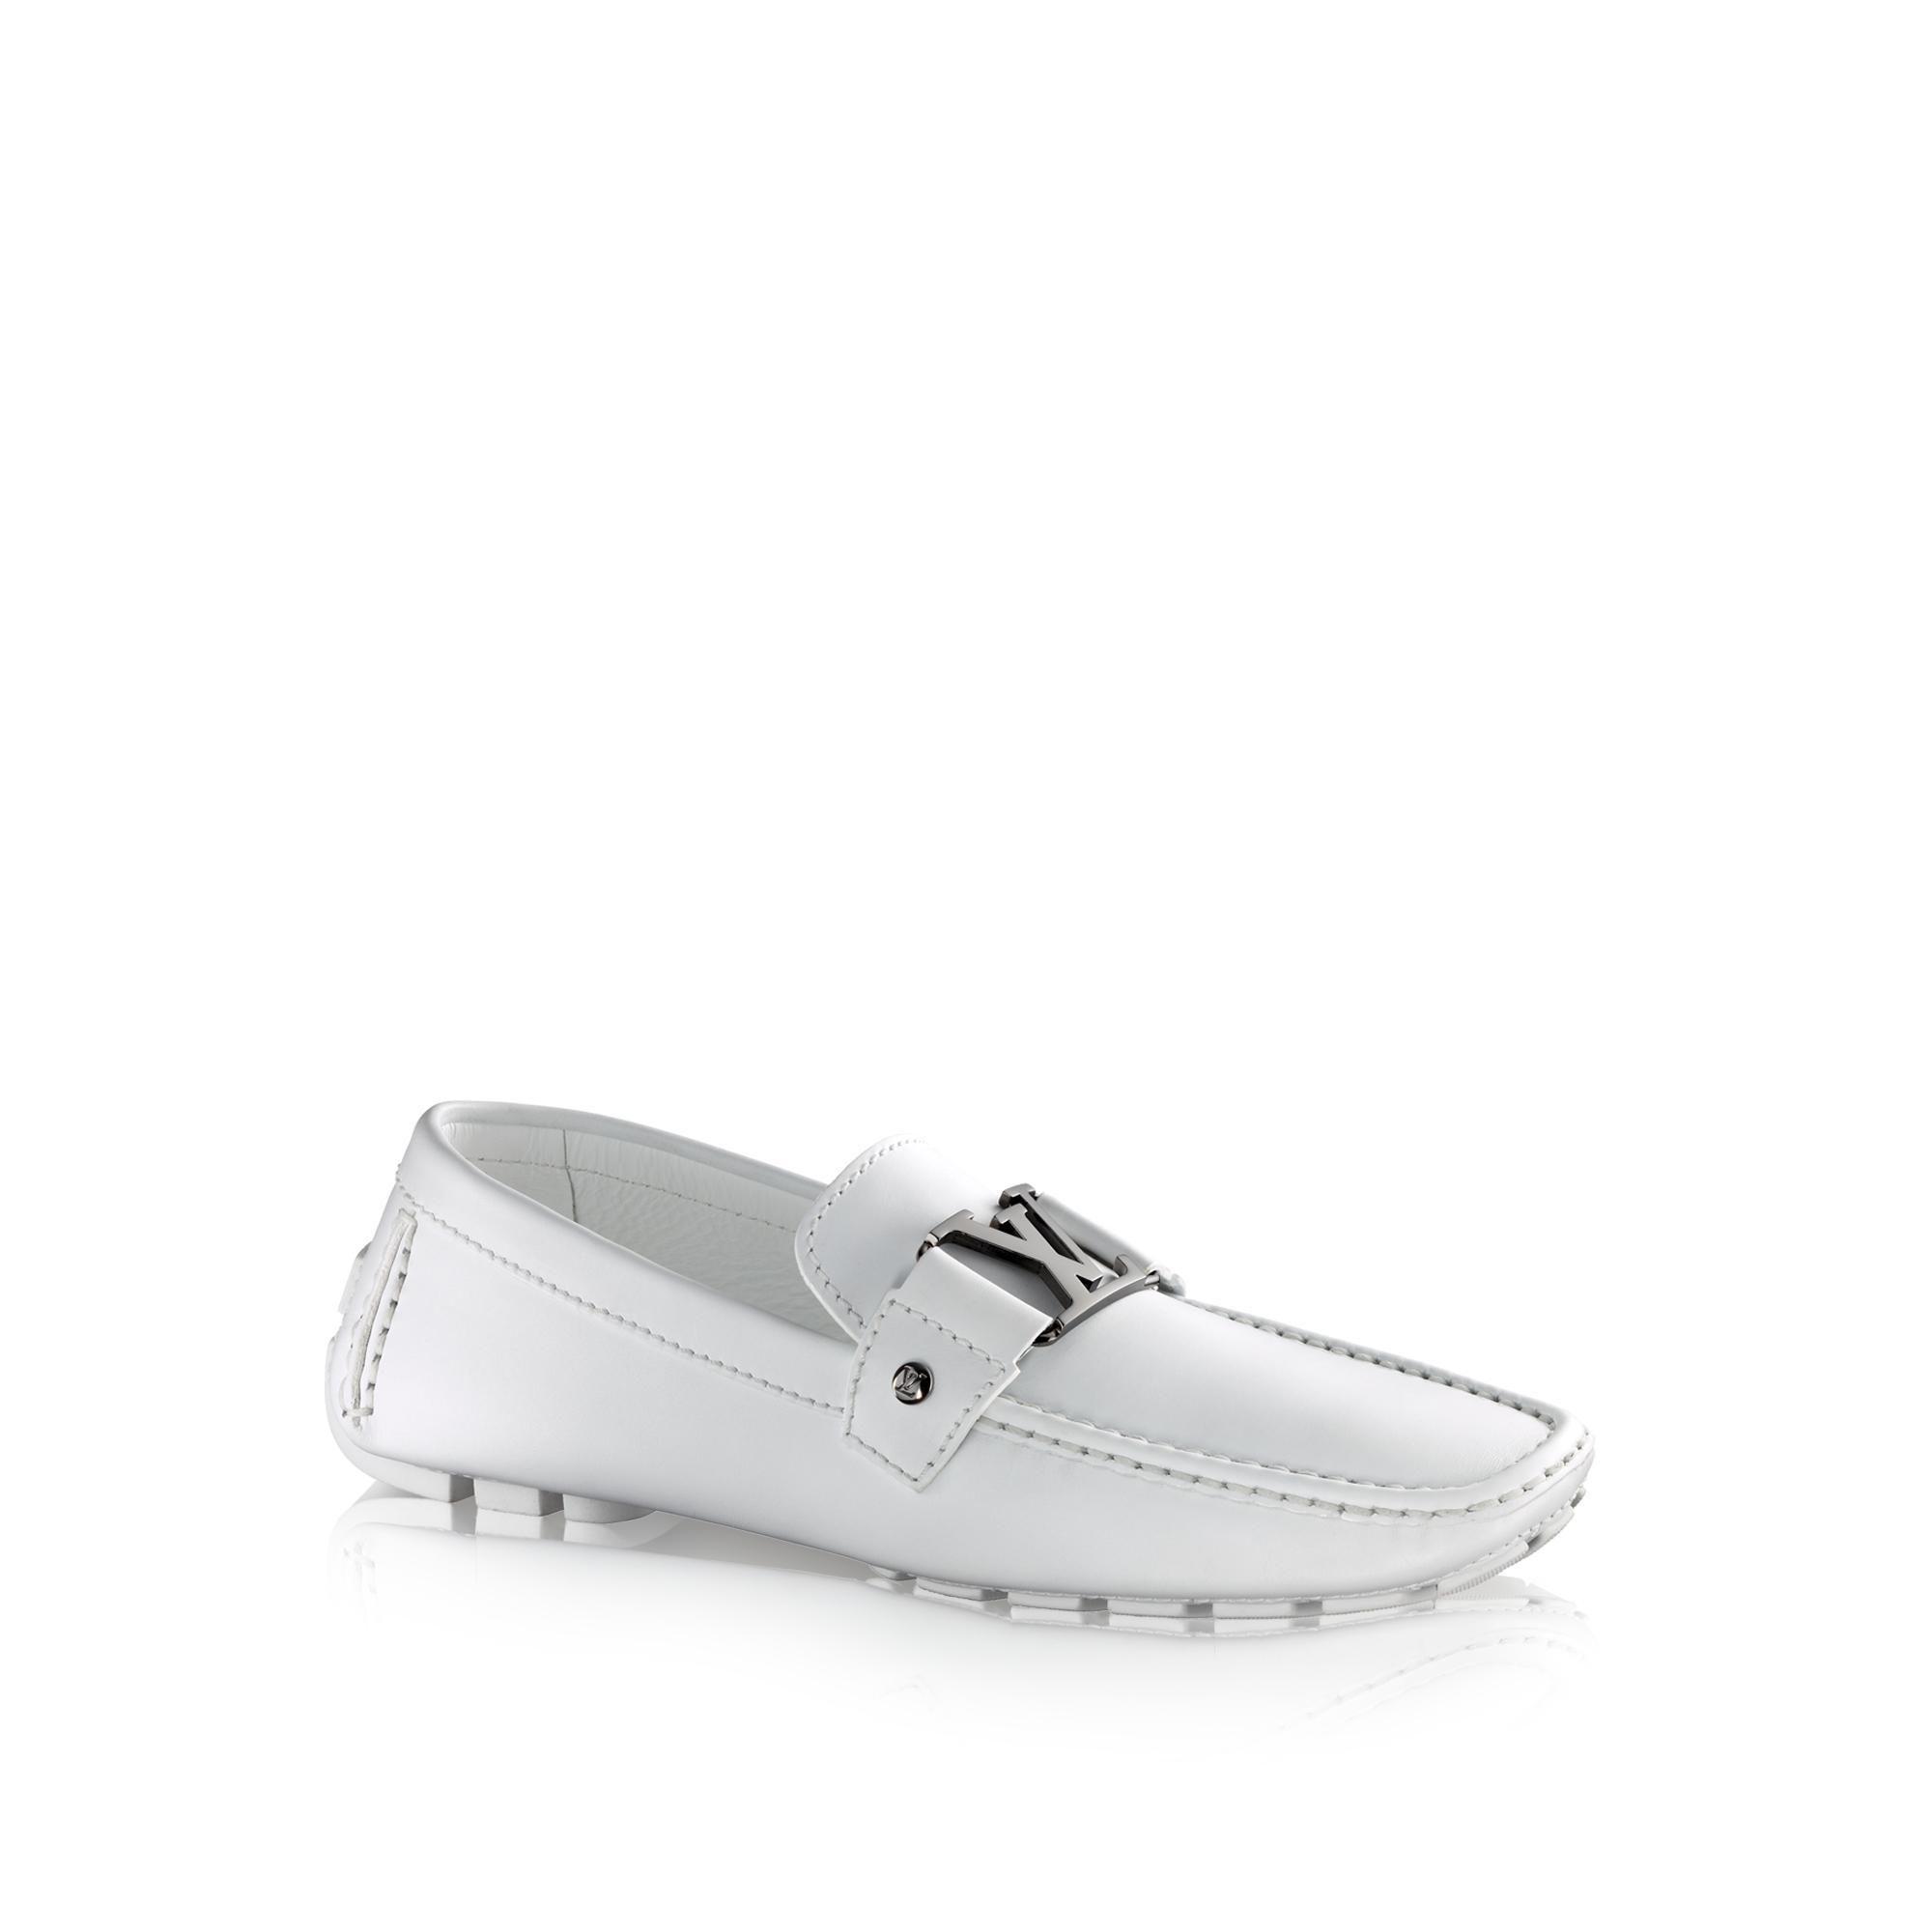 4493868a3e10 LOUIS VUITTON Monte Carlo Car Shoe.  louisvuitton  shoes